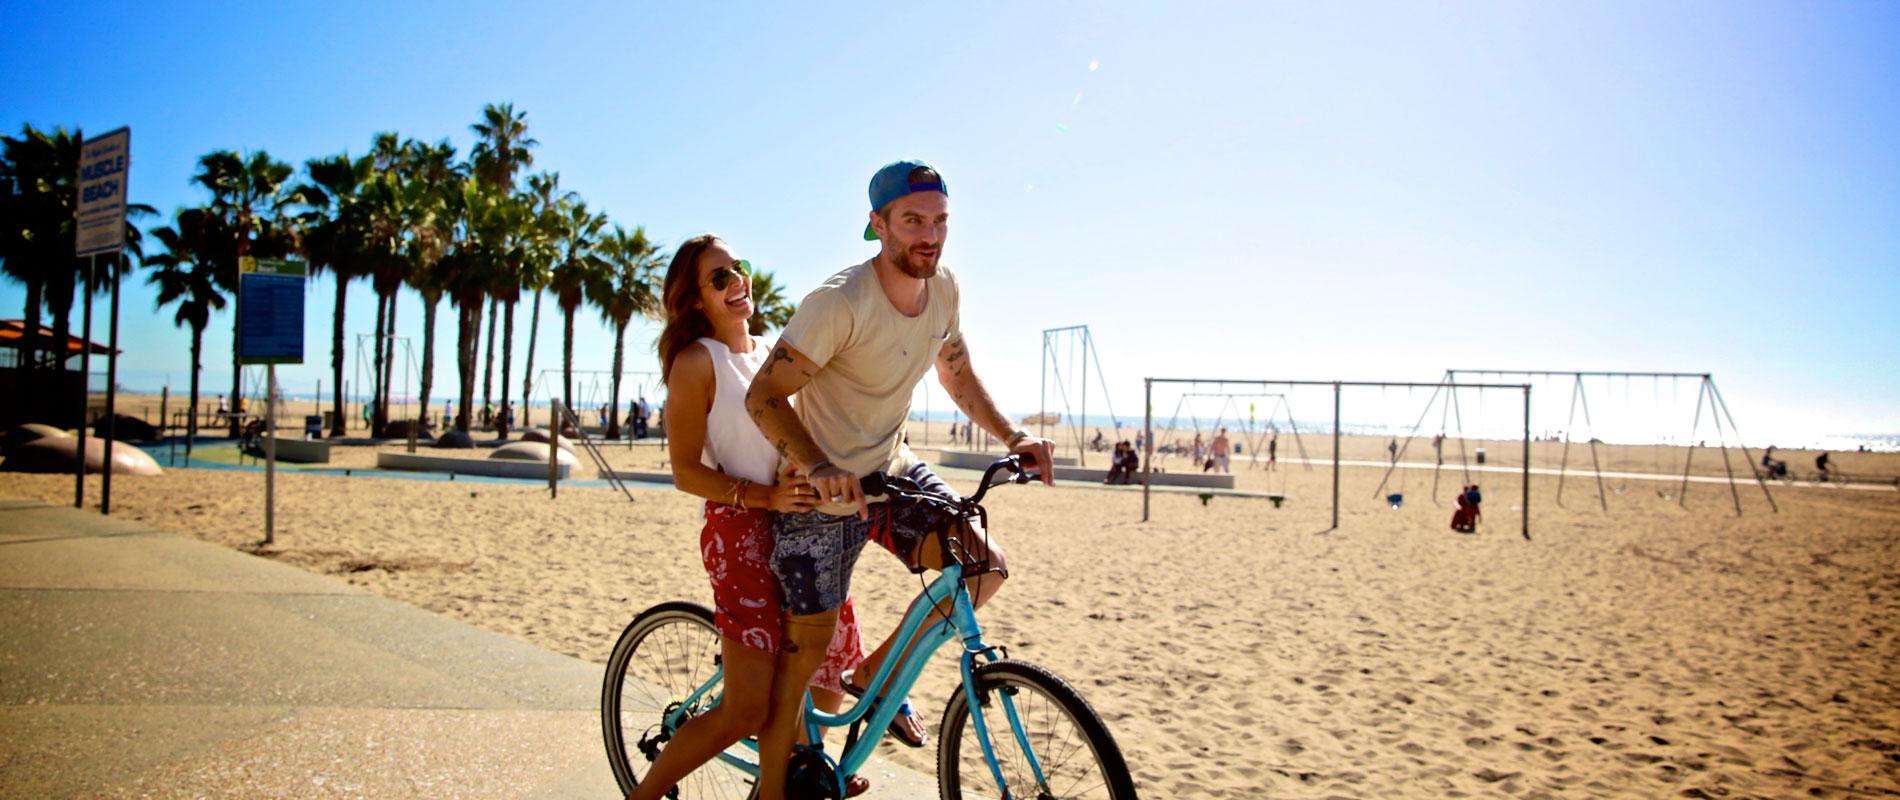 photo credit to Santa Monica Tourism